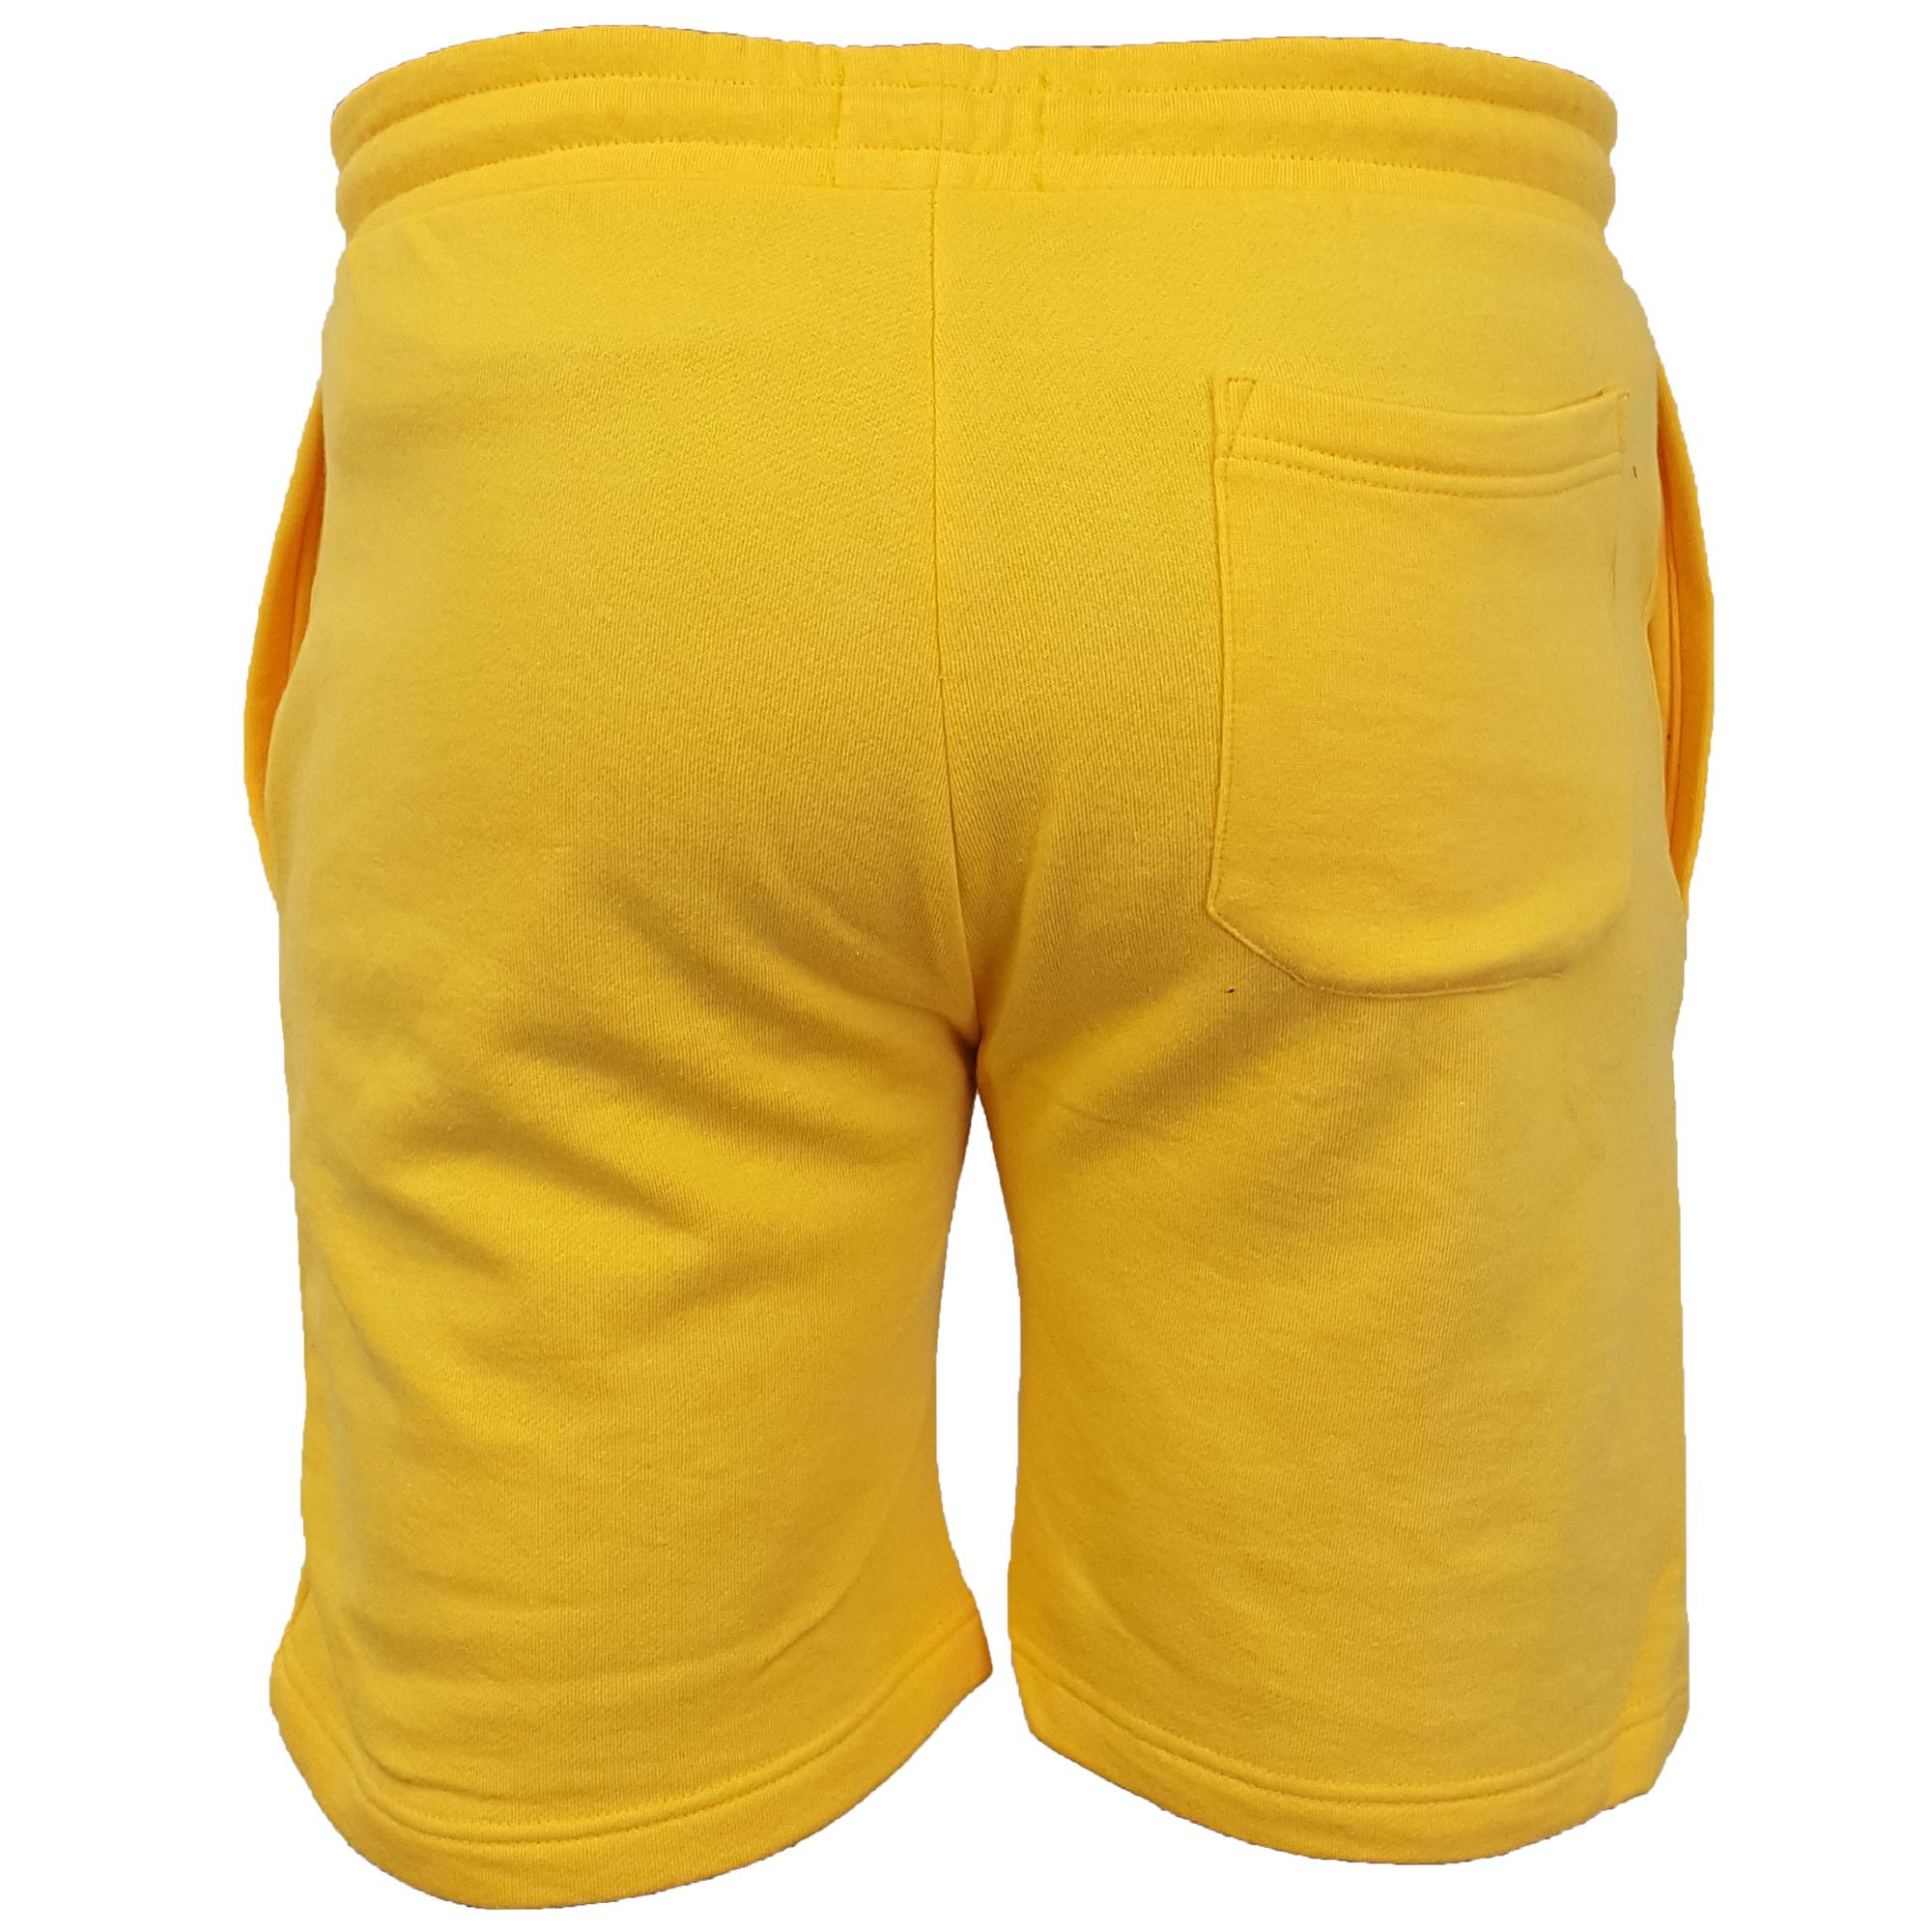 Mens-Jogger-Shorts-Tarley-by-Brave-Soul-Knee-Length-Casual-Fleece-Lined-Summer thumbnail 23